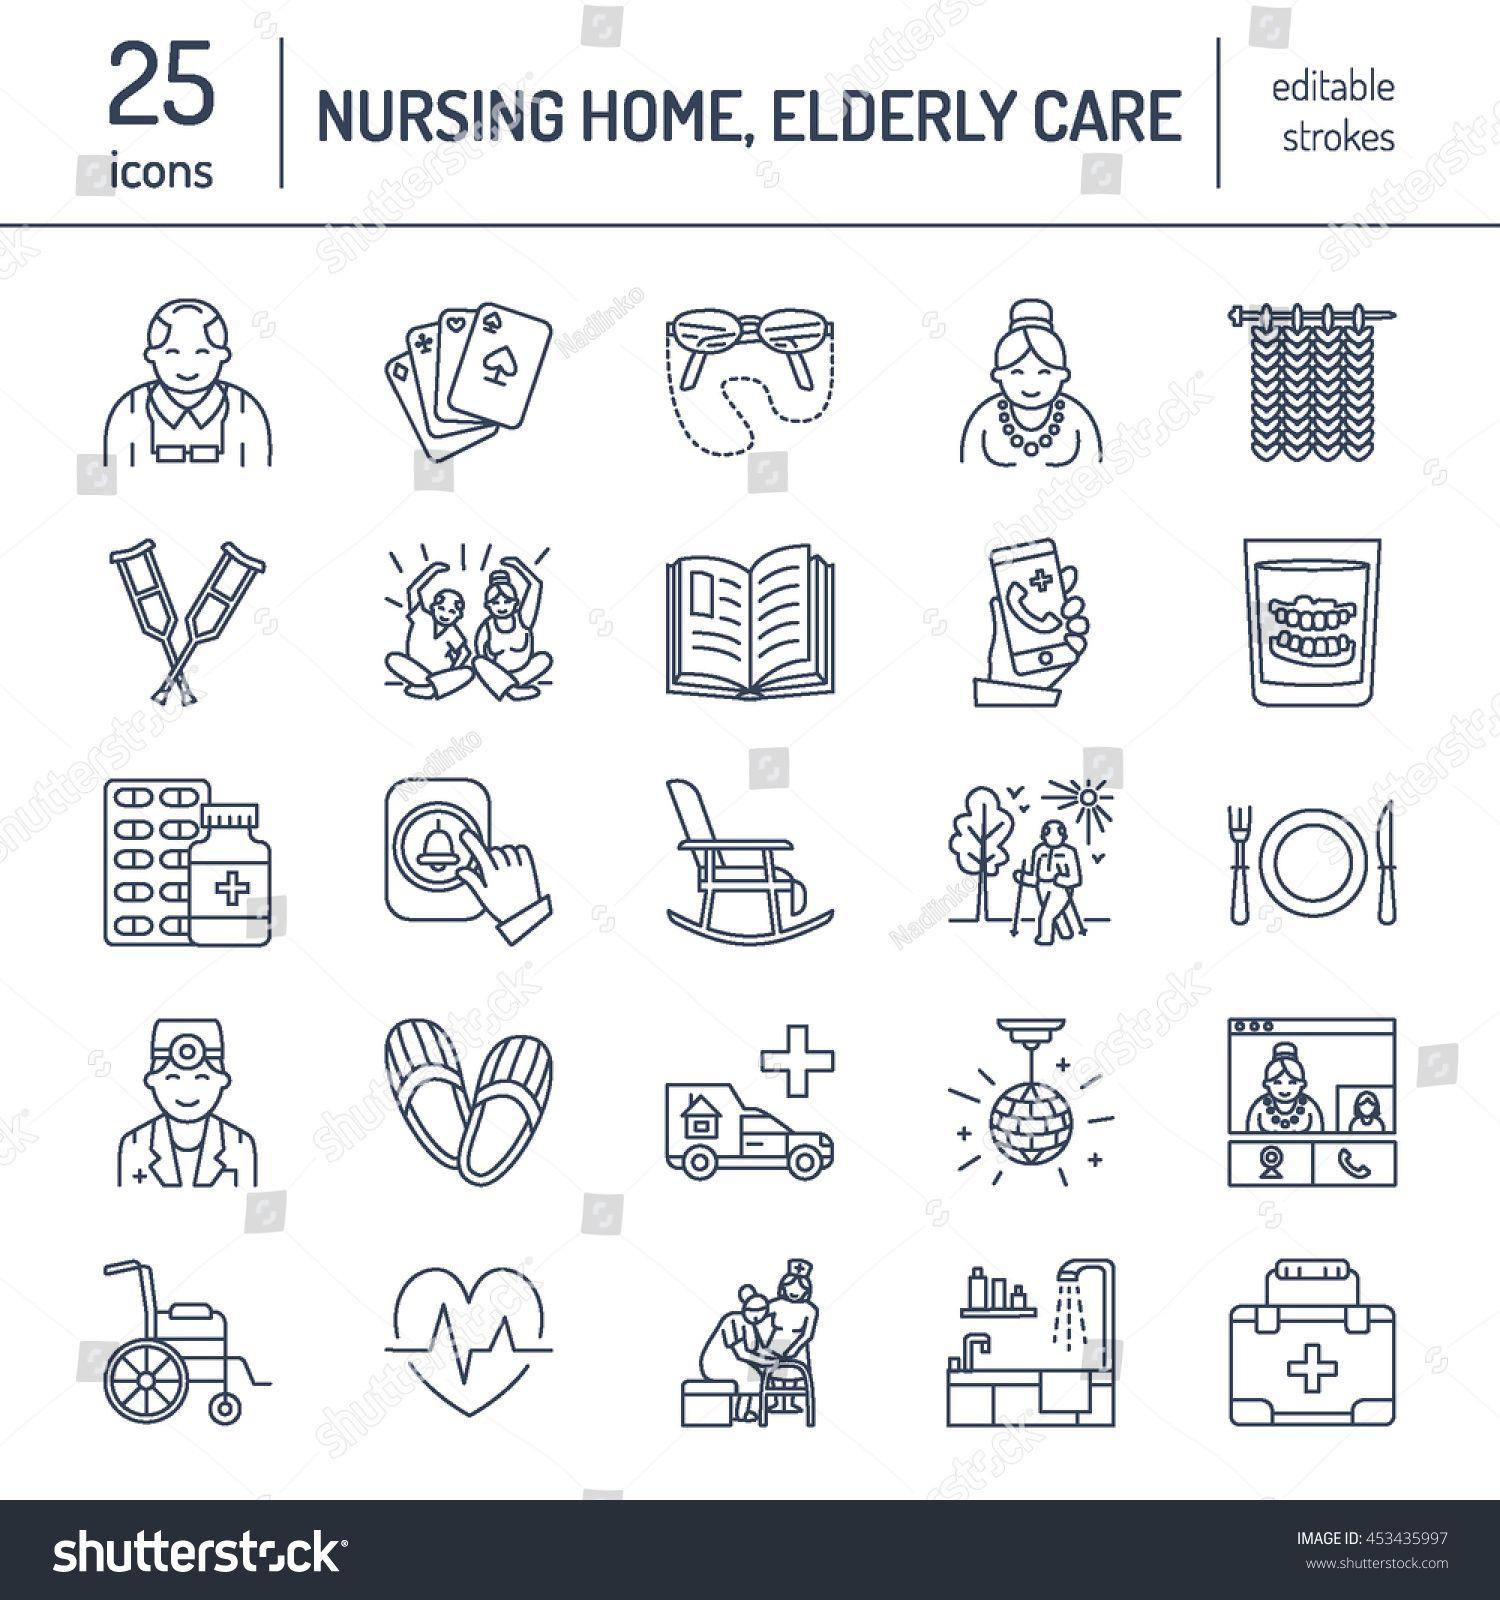 Modern vector line icon of senior and elderly care